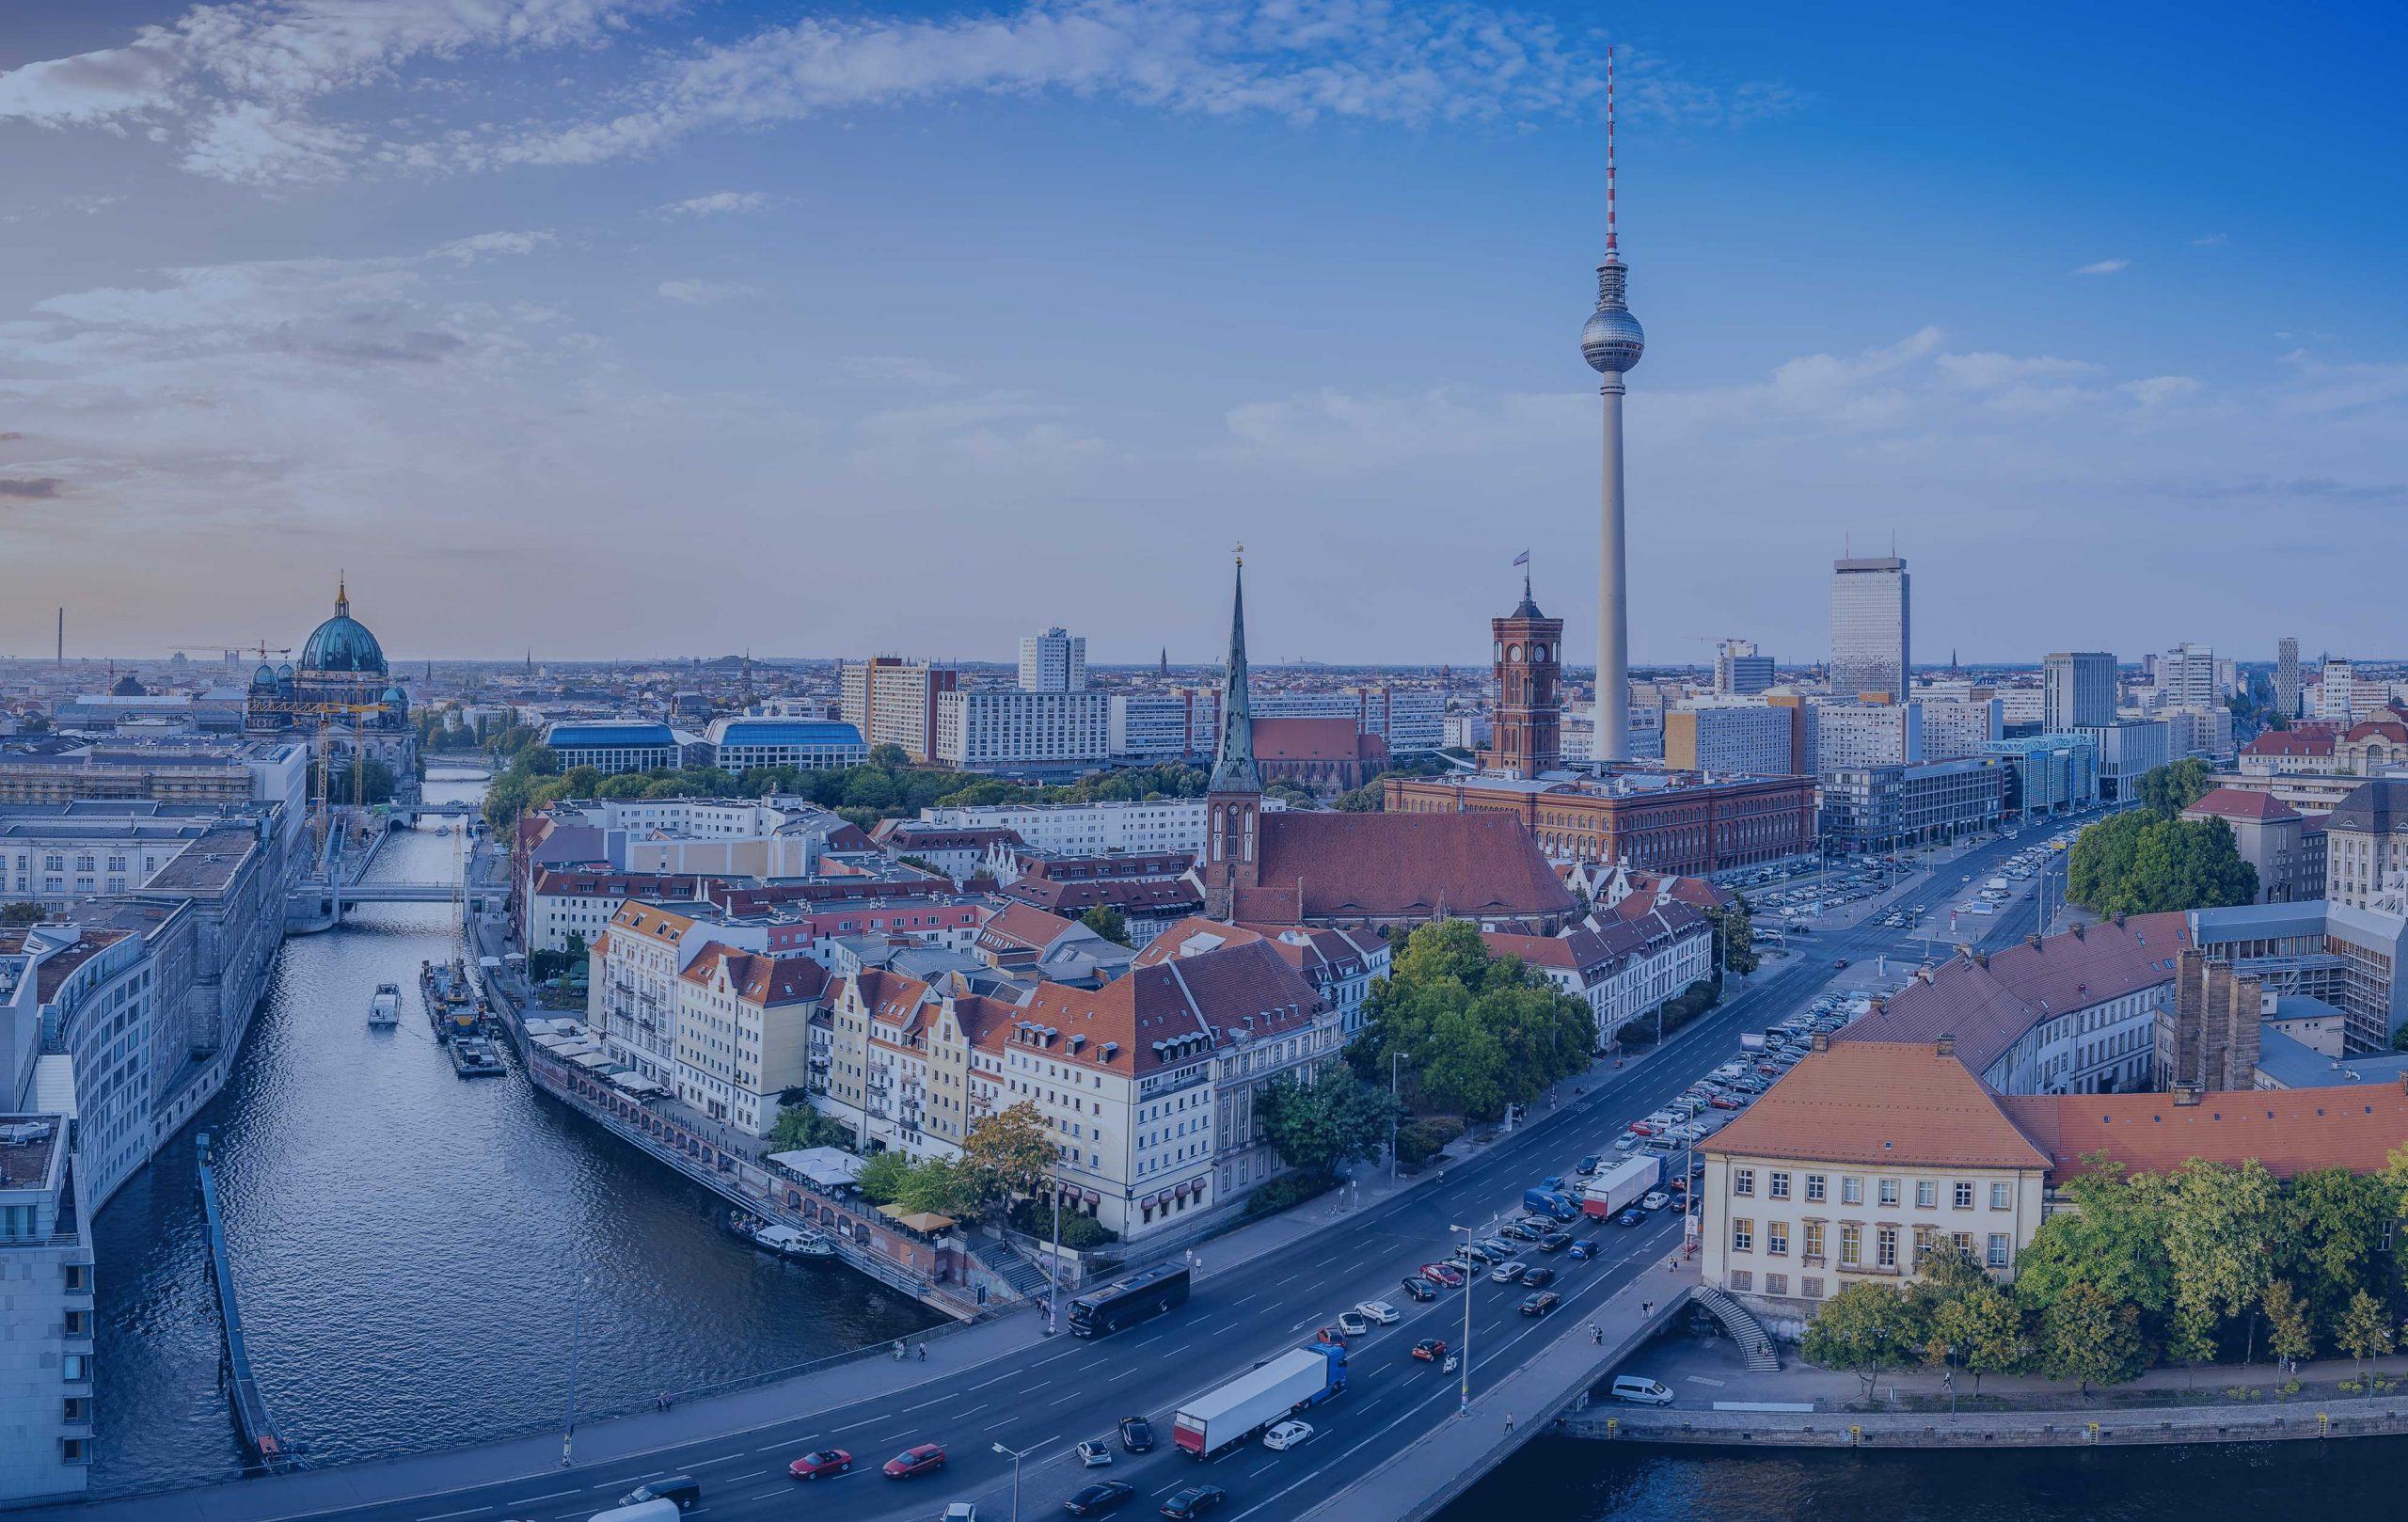 Vue aérienne de Berlin